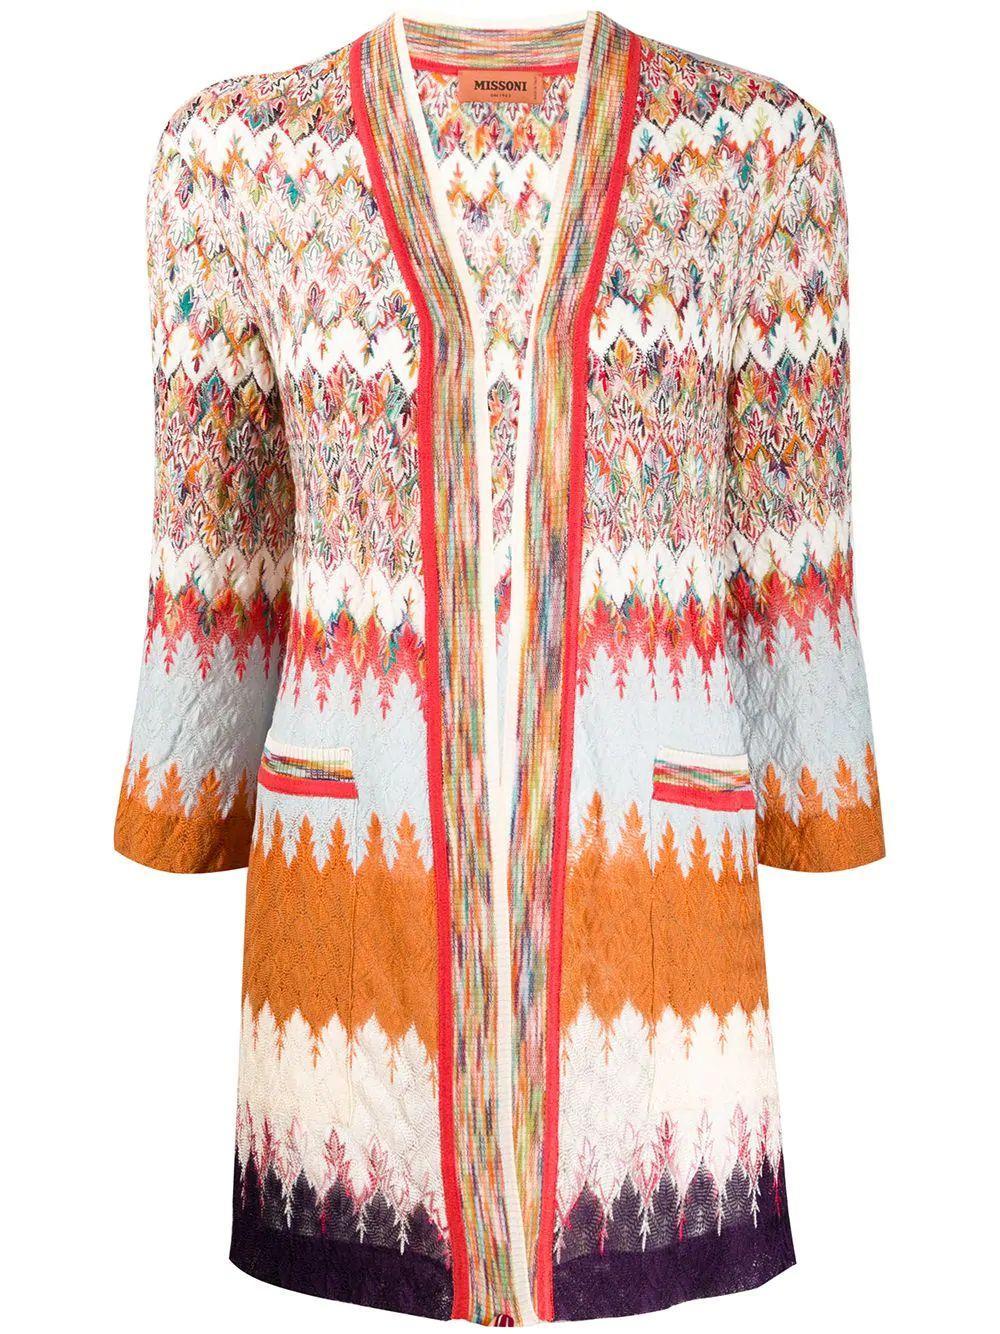 3/4 Full Sleeve Open Cardigan Item # MDM00098-BR007T